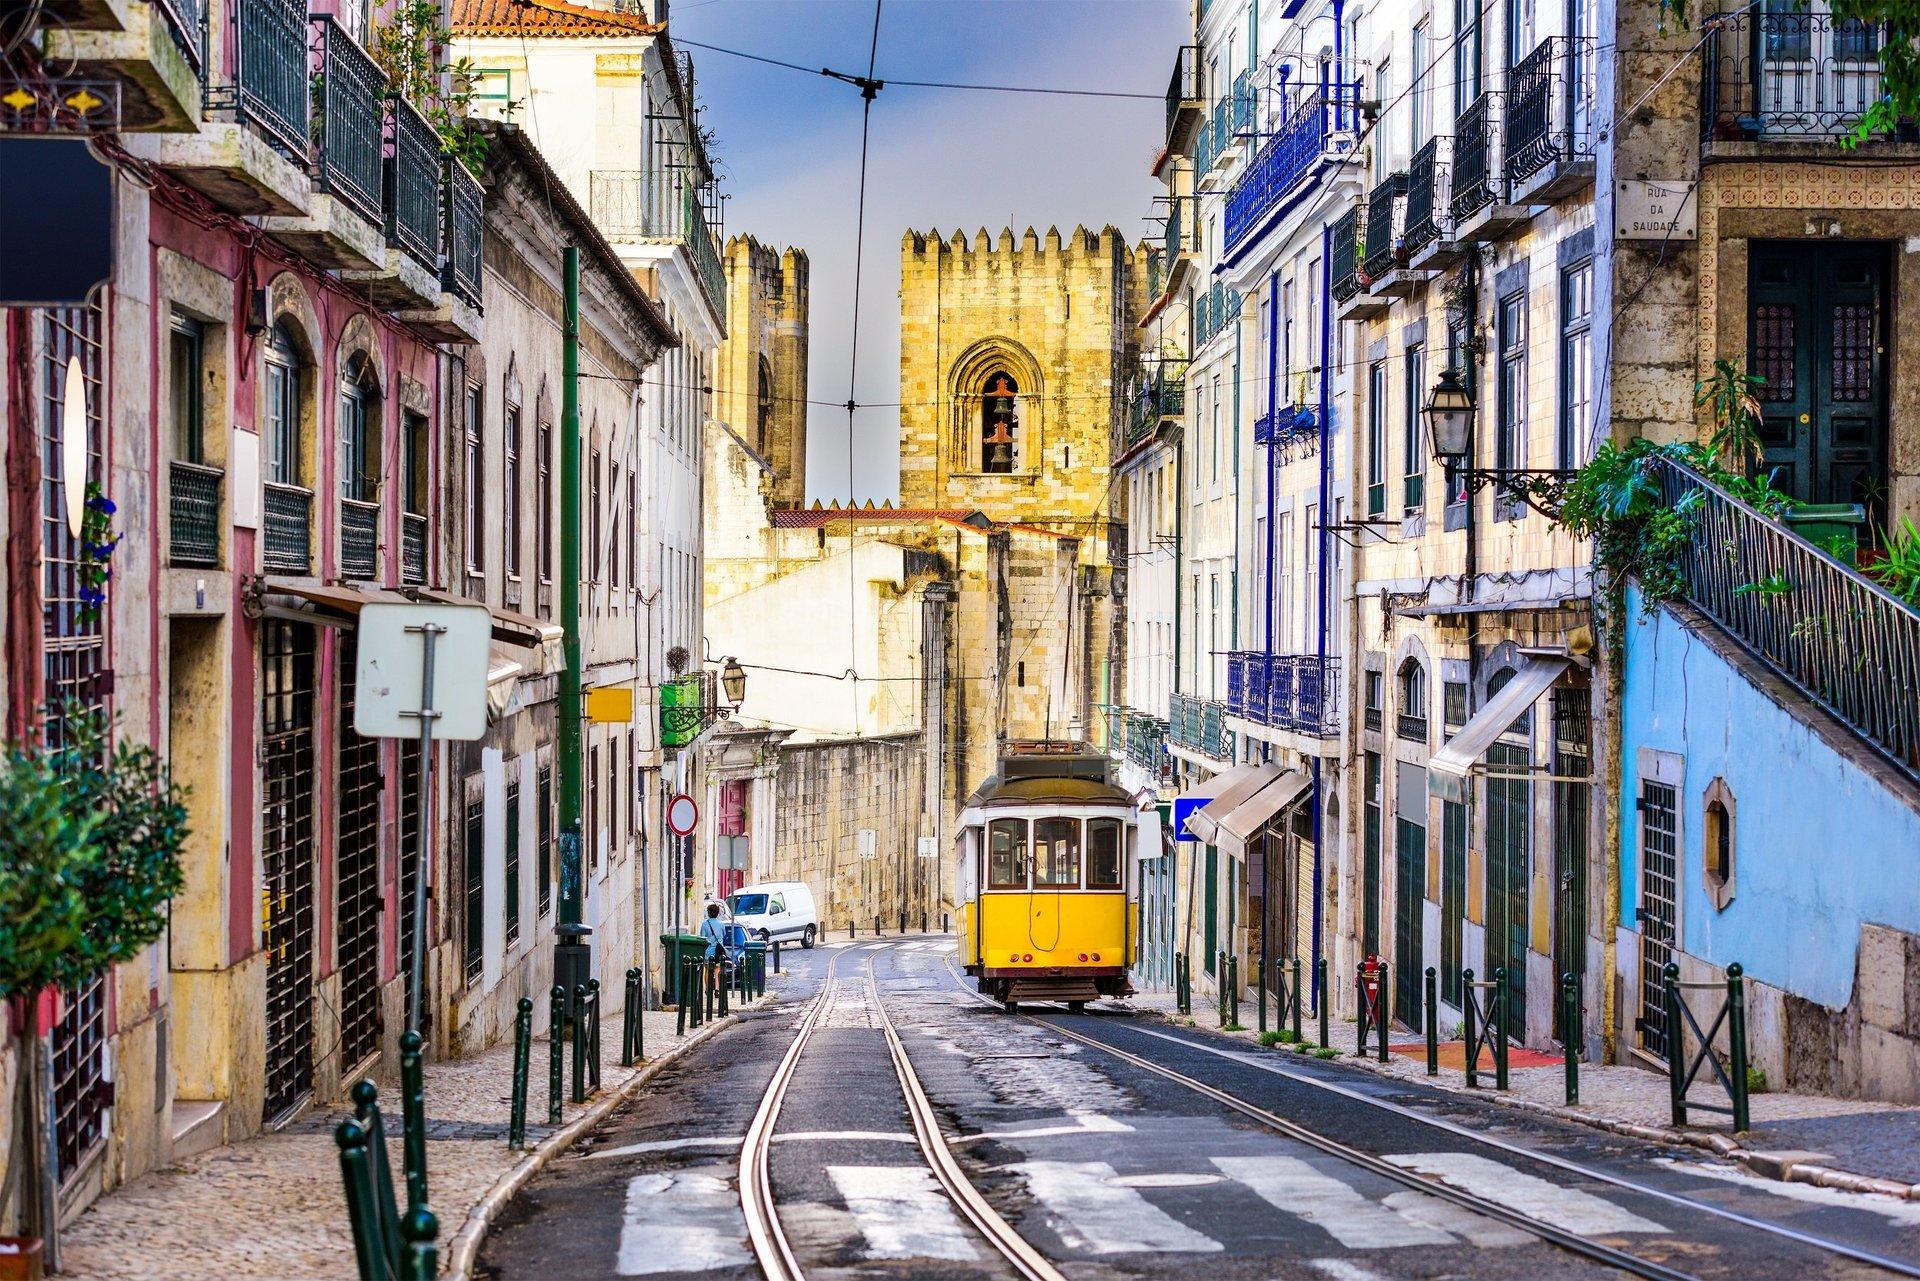 Lissabon kust - Lissabon